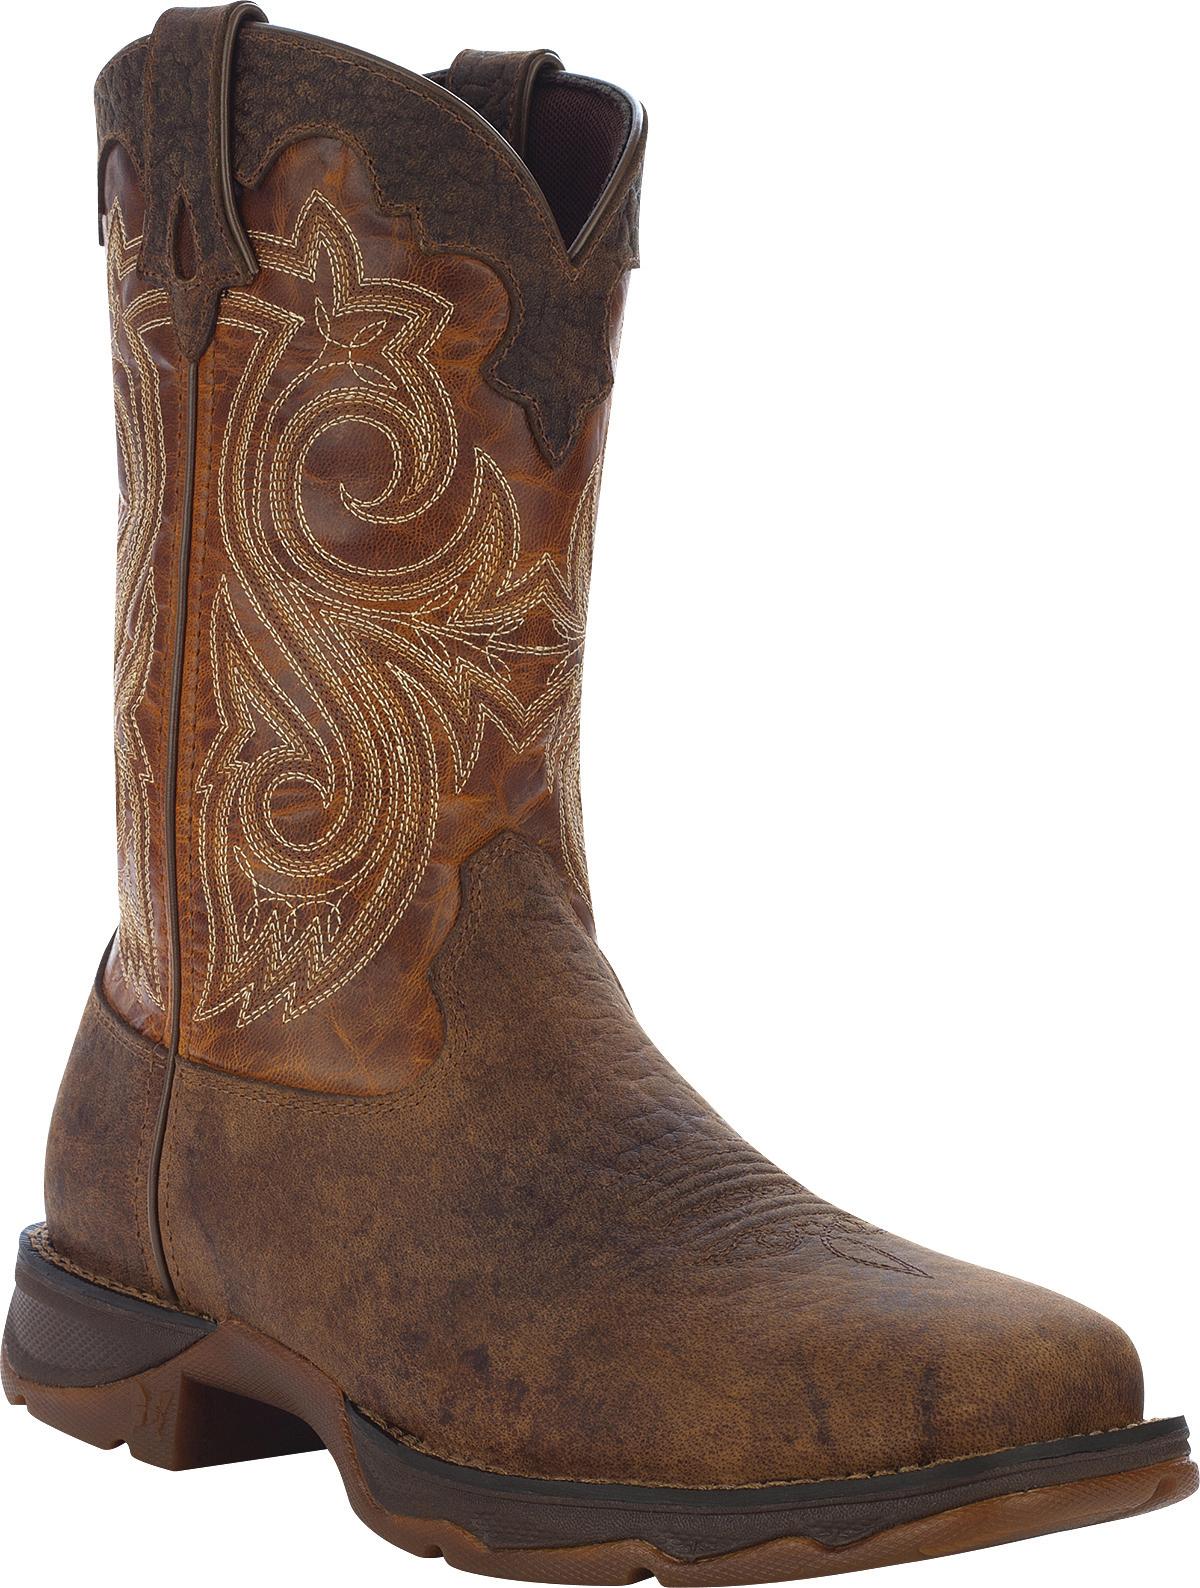 Durango RD3315 Lady Rebel Women's Steel Toe Western Boots at Sears.com